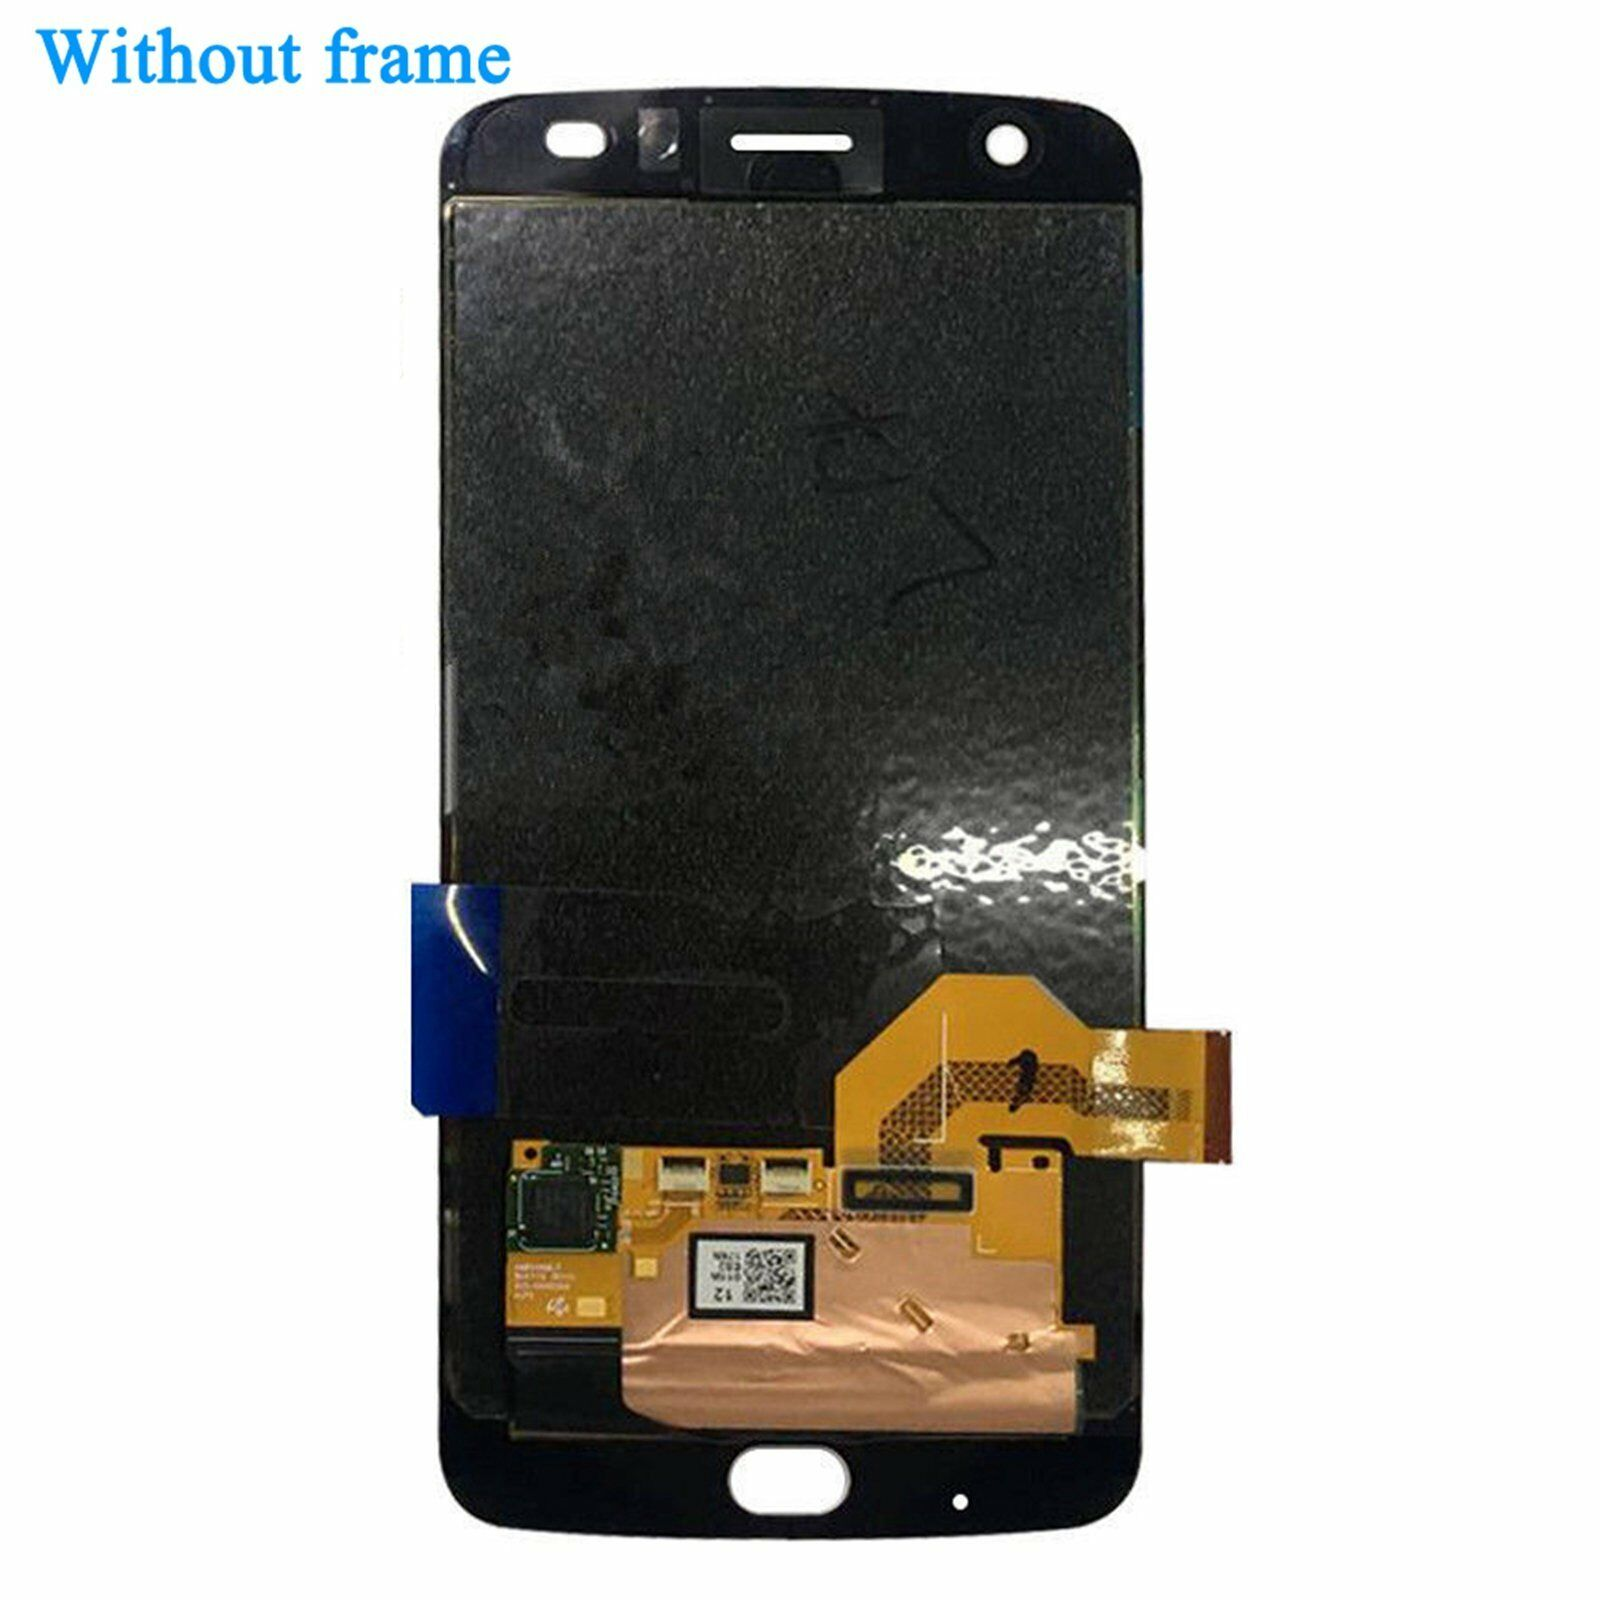 صفحه-نمایش-گوشی-موبایل-lcd-touch-screen-Motorola-Moto-Z2-Force(4).jpg